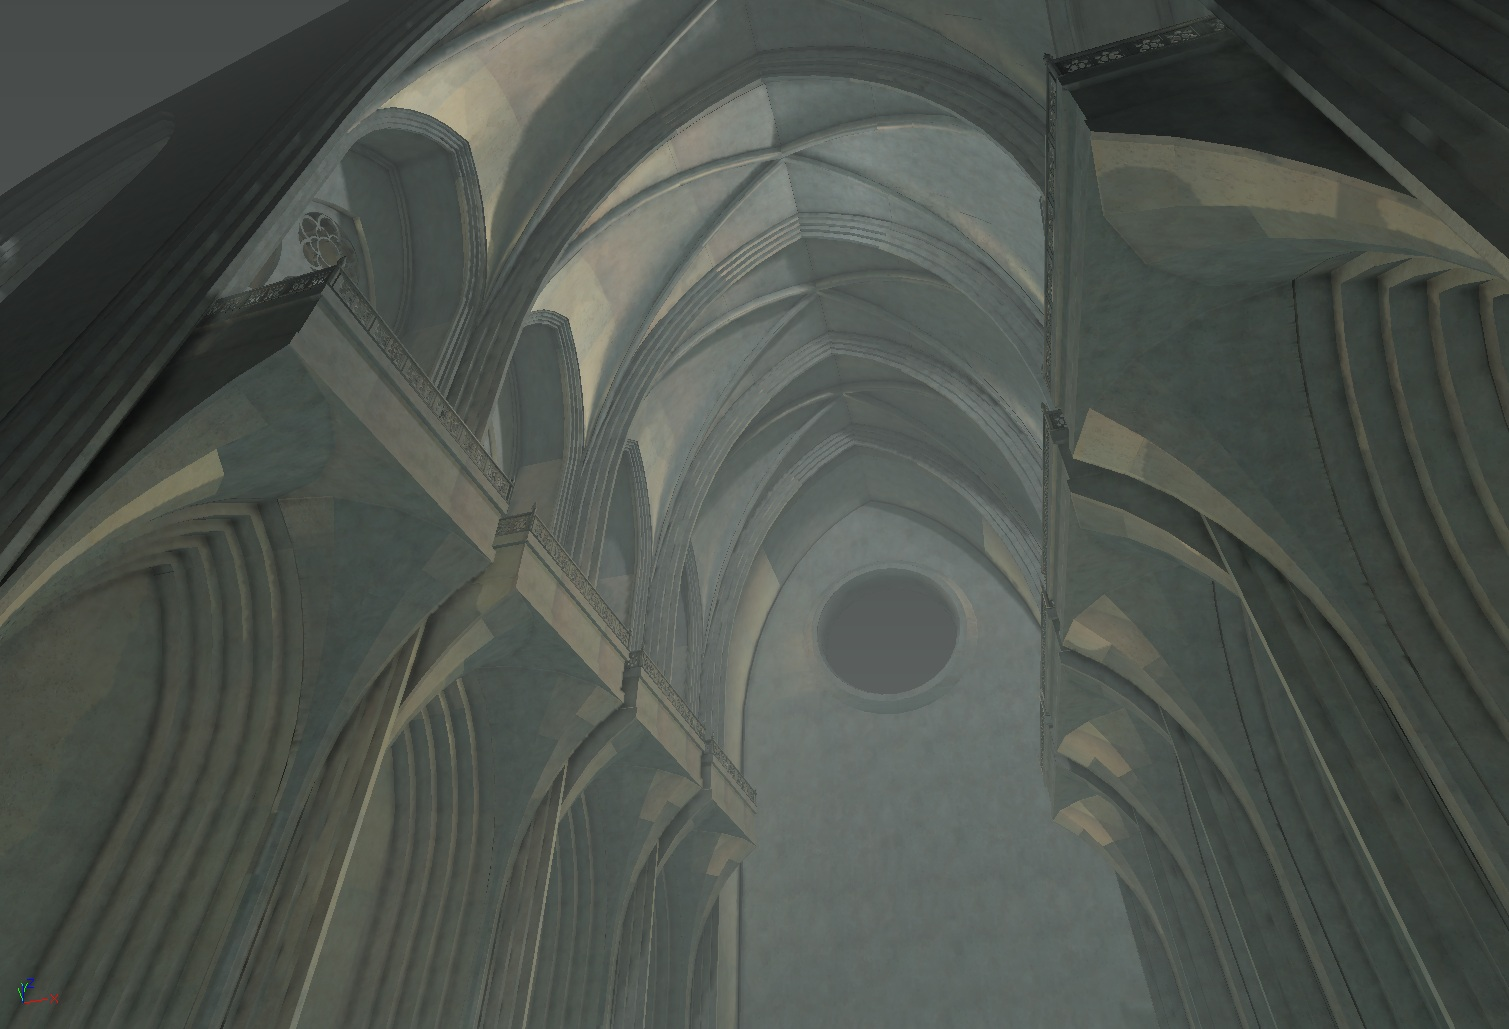 Cathedral 2 - Work in Progress by DigitalNightfall